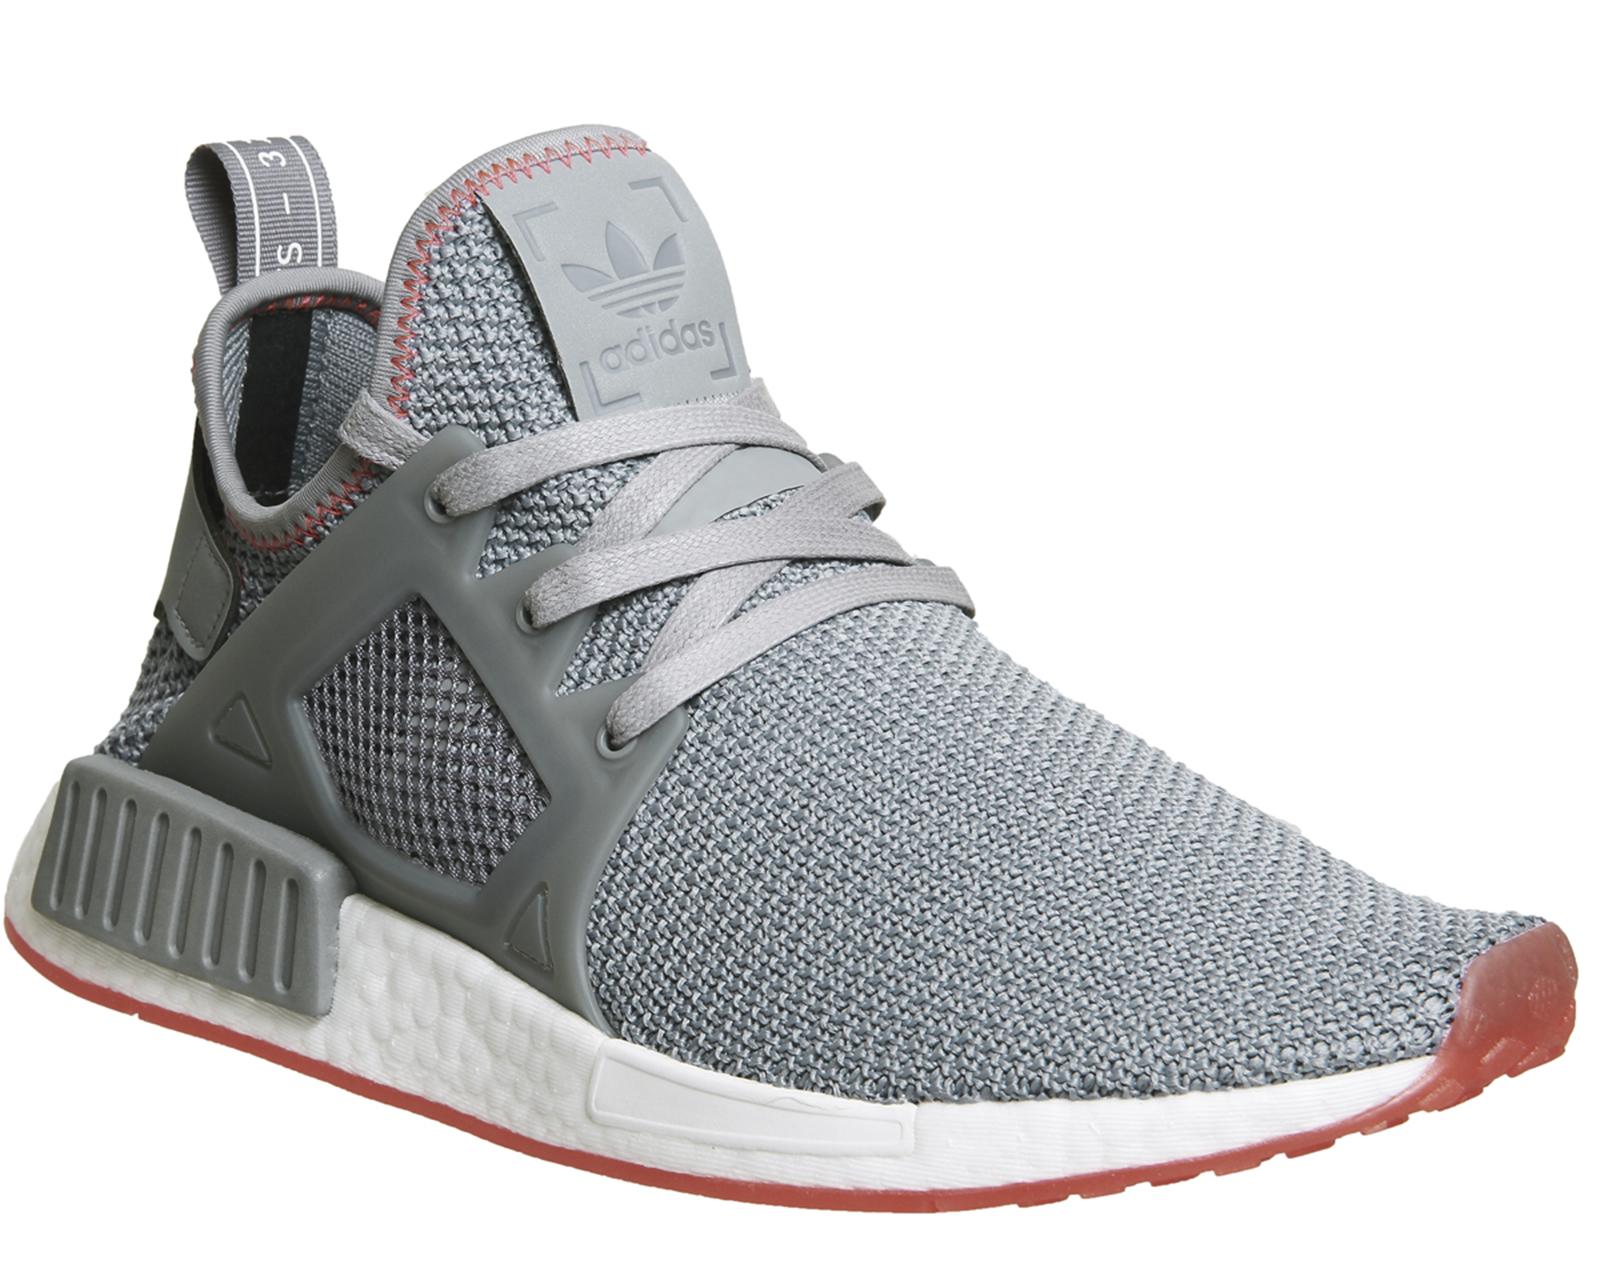 ead398aa488 Adidas Nmd Xr1 GREY GREY SOLAR RED Trainers Shoes